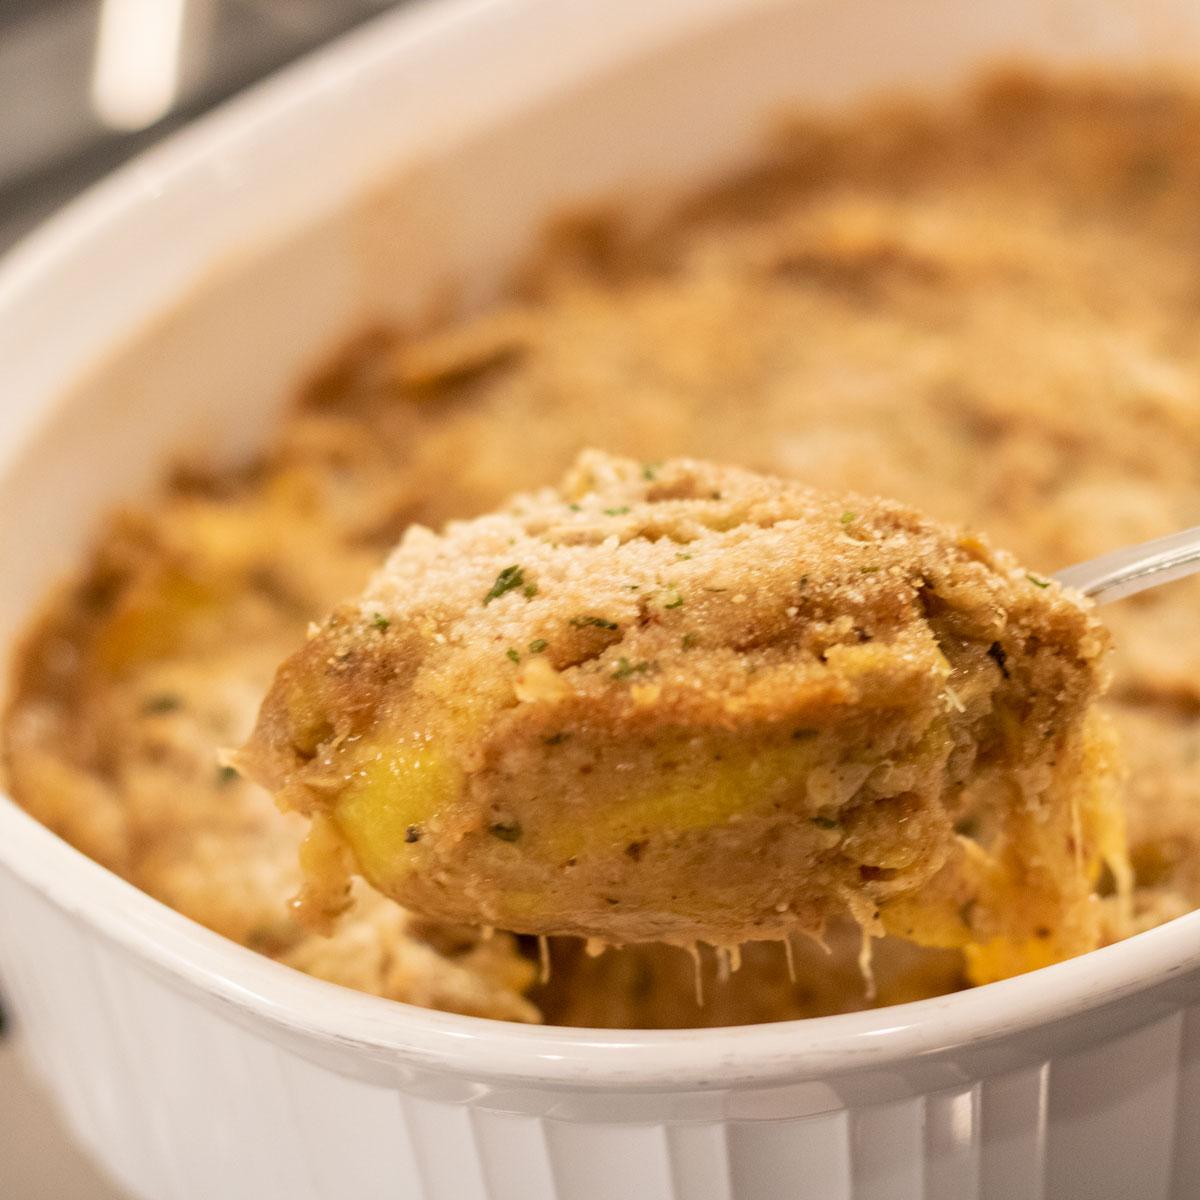 spoon full of yellow squash casserole